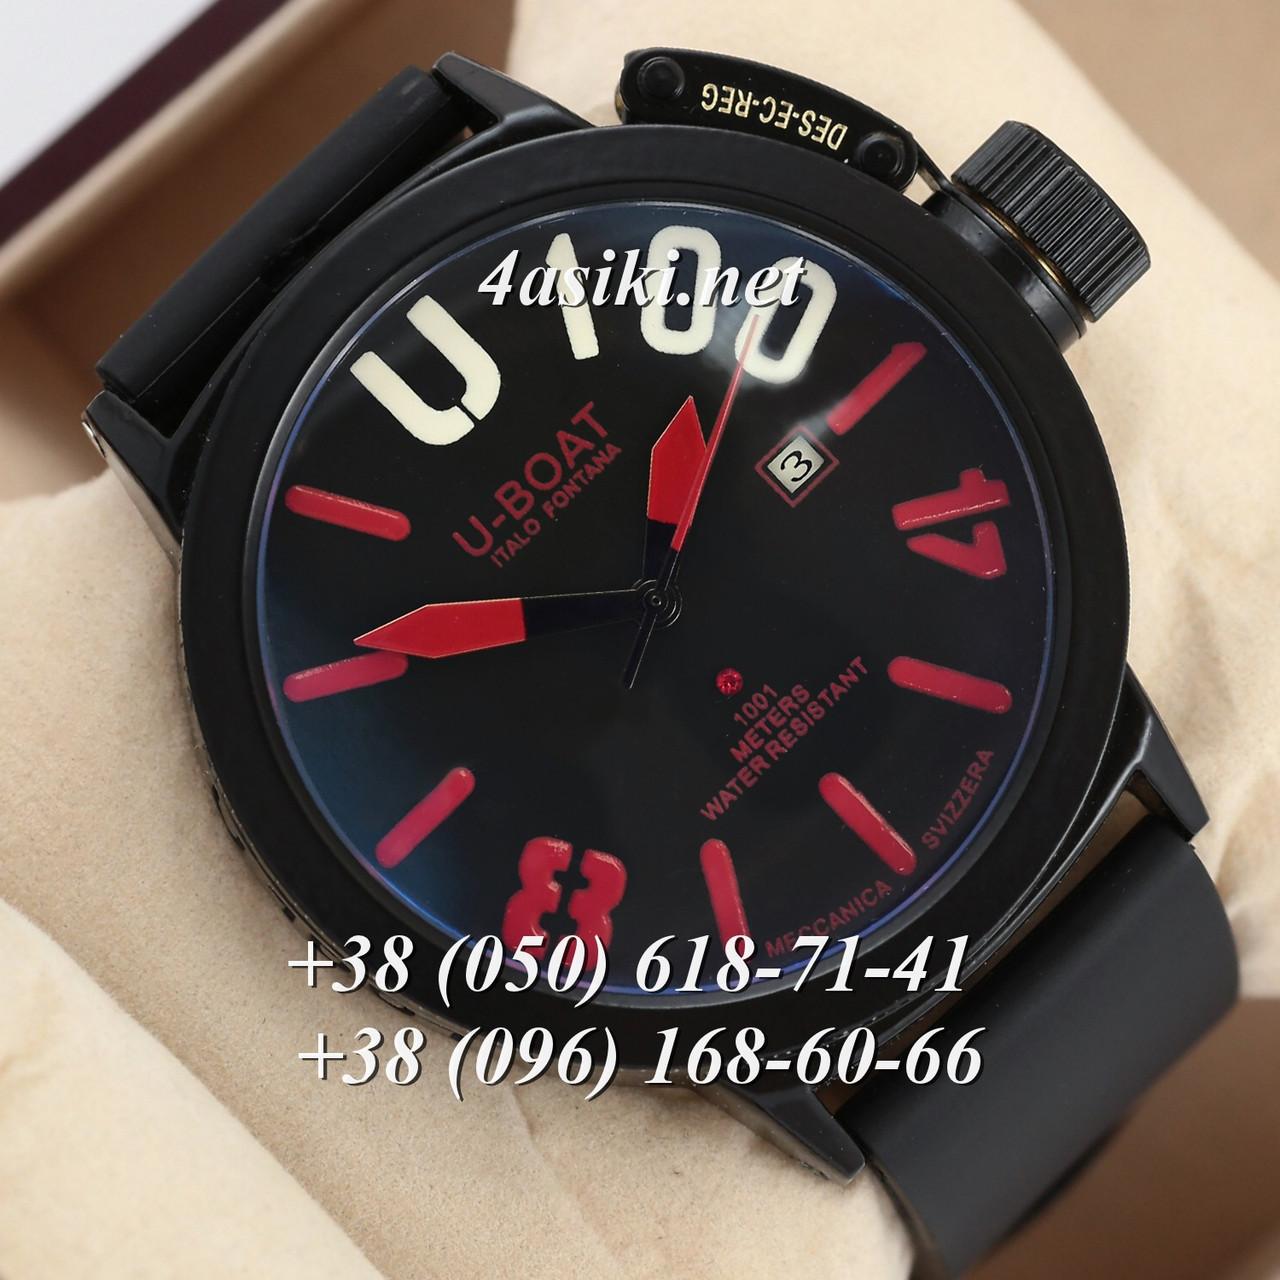 Часы U-boat Italo Fontana U-1001 Classico Black-Black-Red реплика